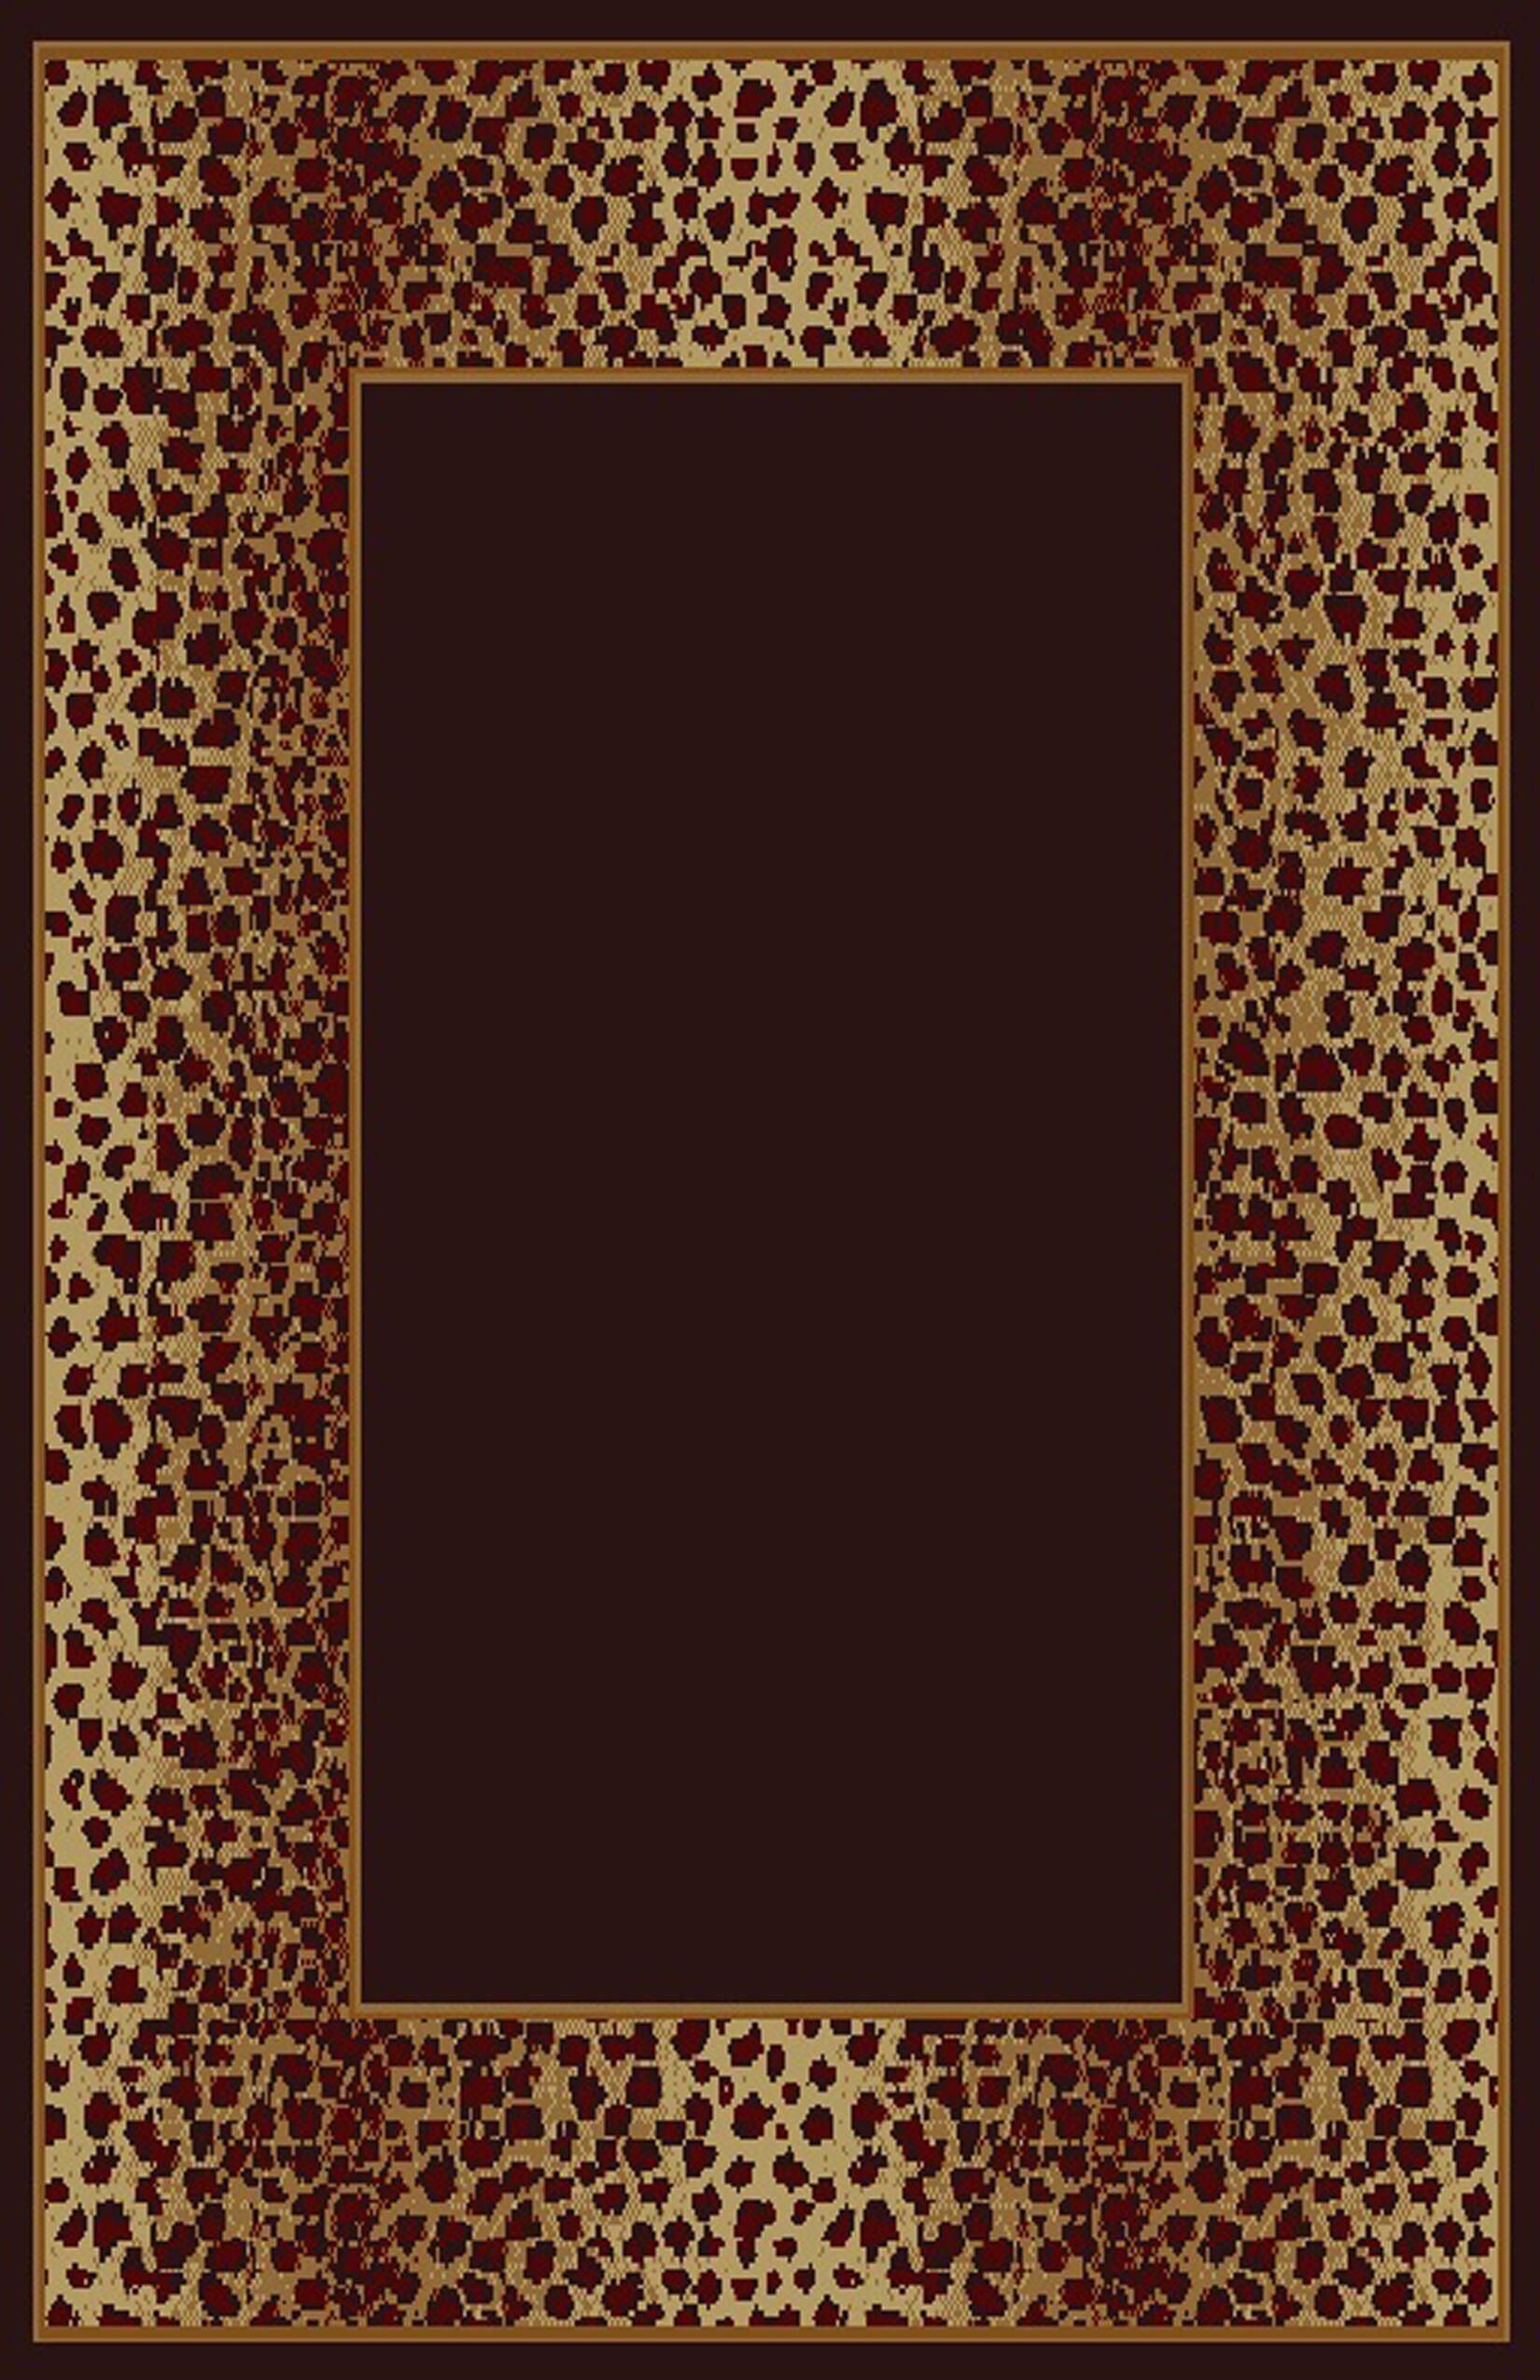 Debora Black/Brown Area Rug Rug Size: 5'3